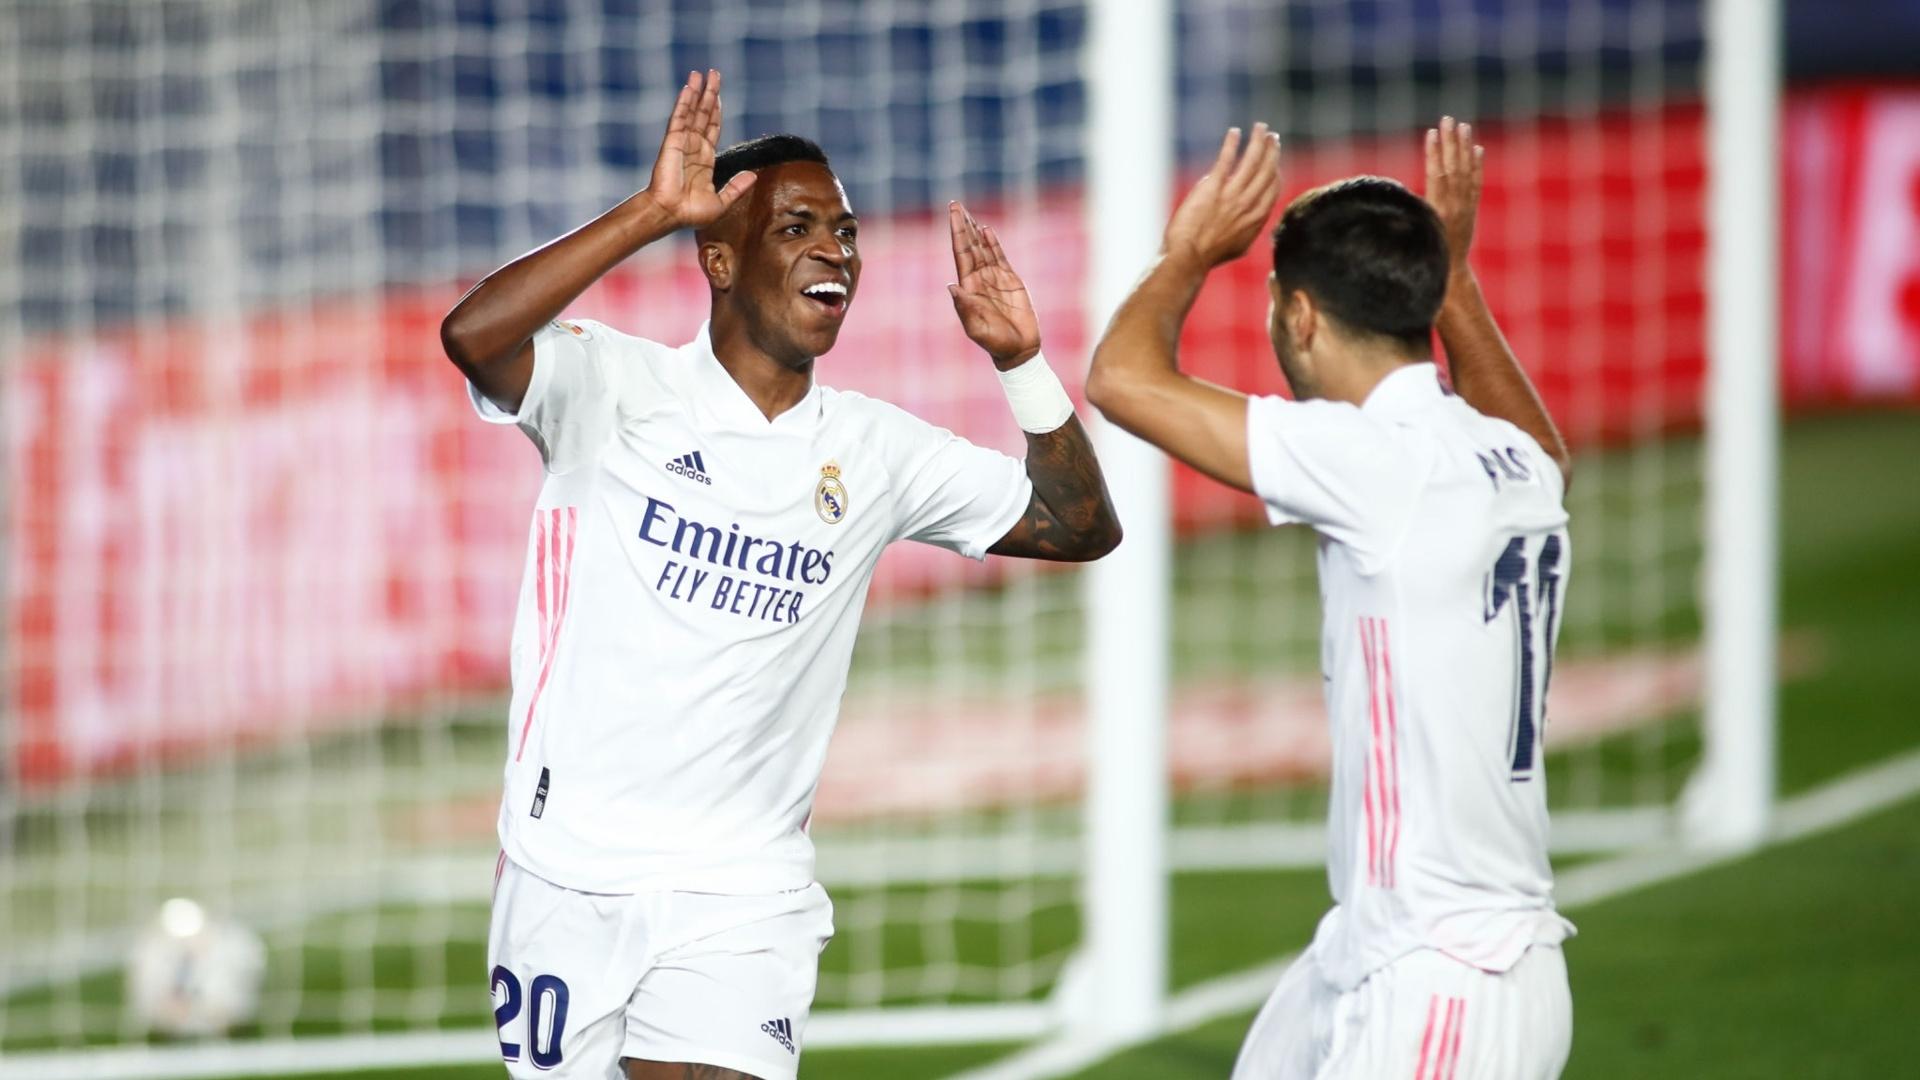 Match preview: Real Madrid vs Shakhtar Donetsk